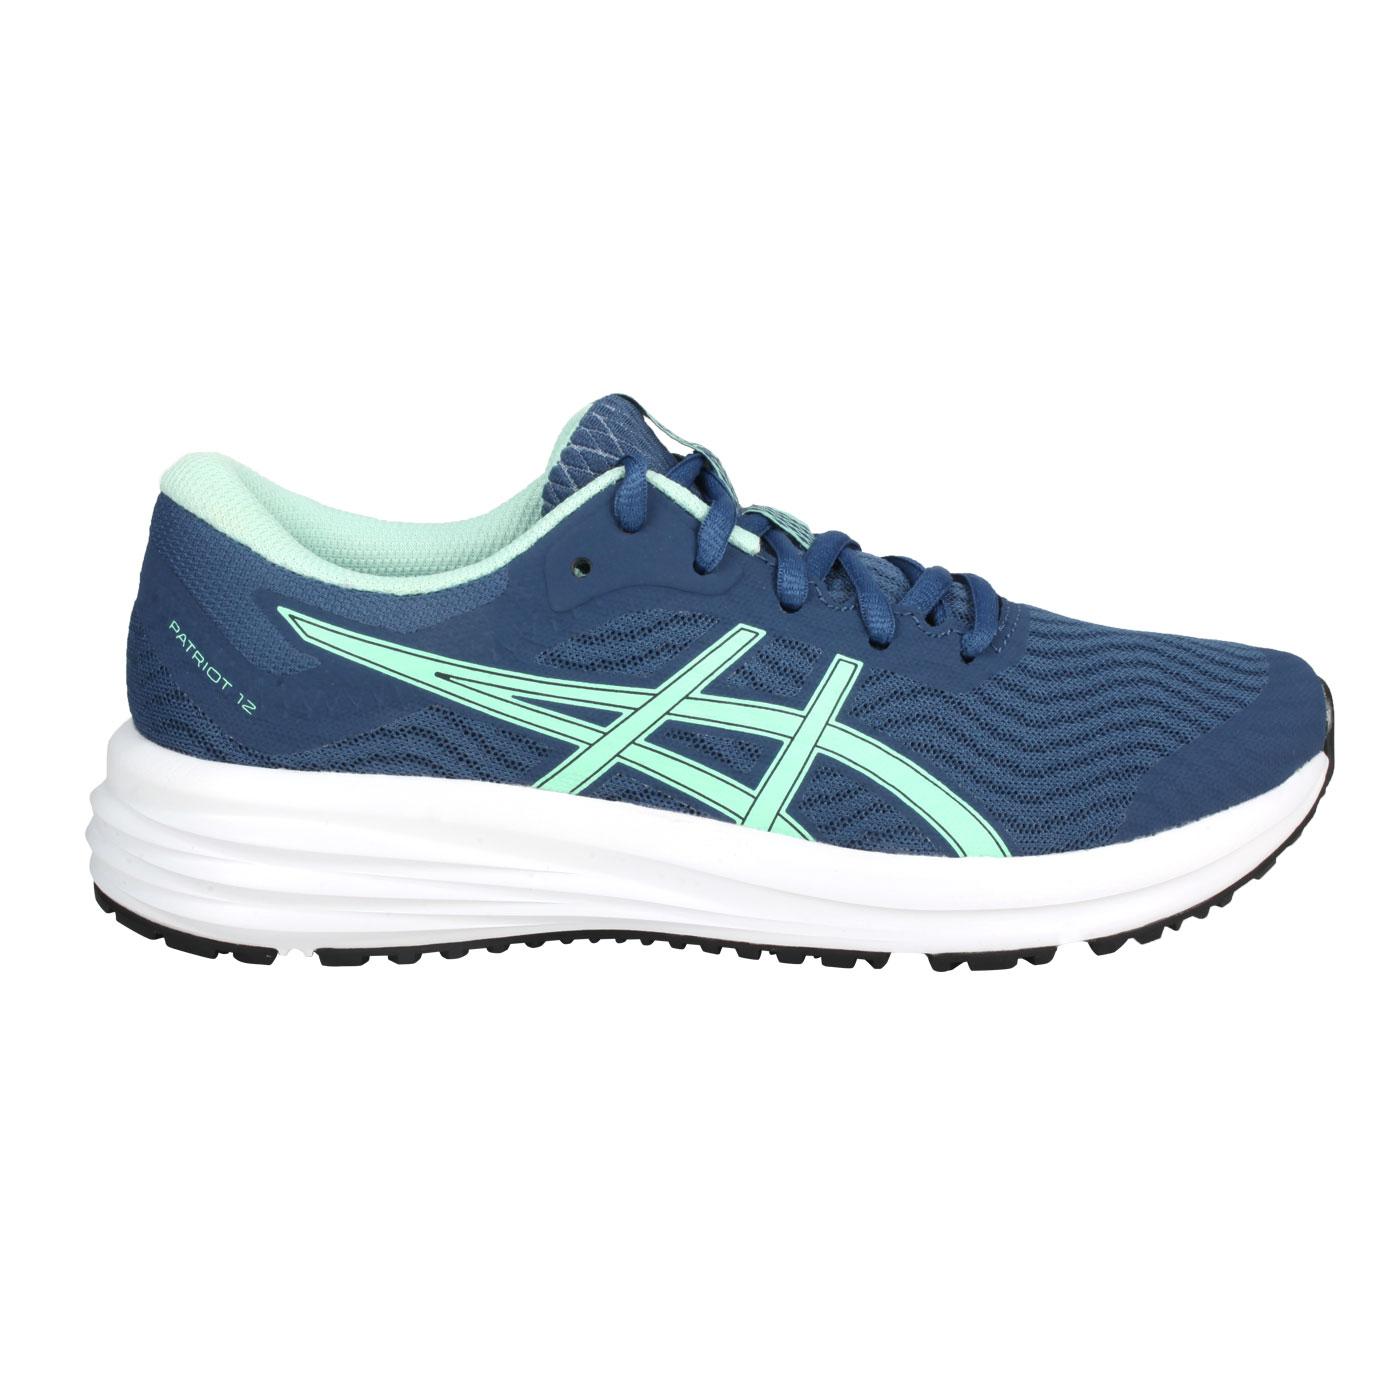 ASICS 女款慢跑鞋  @PATRIOT 12@1012A705-400 - 珊瑚藍粉綠